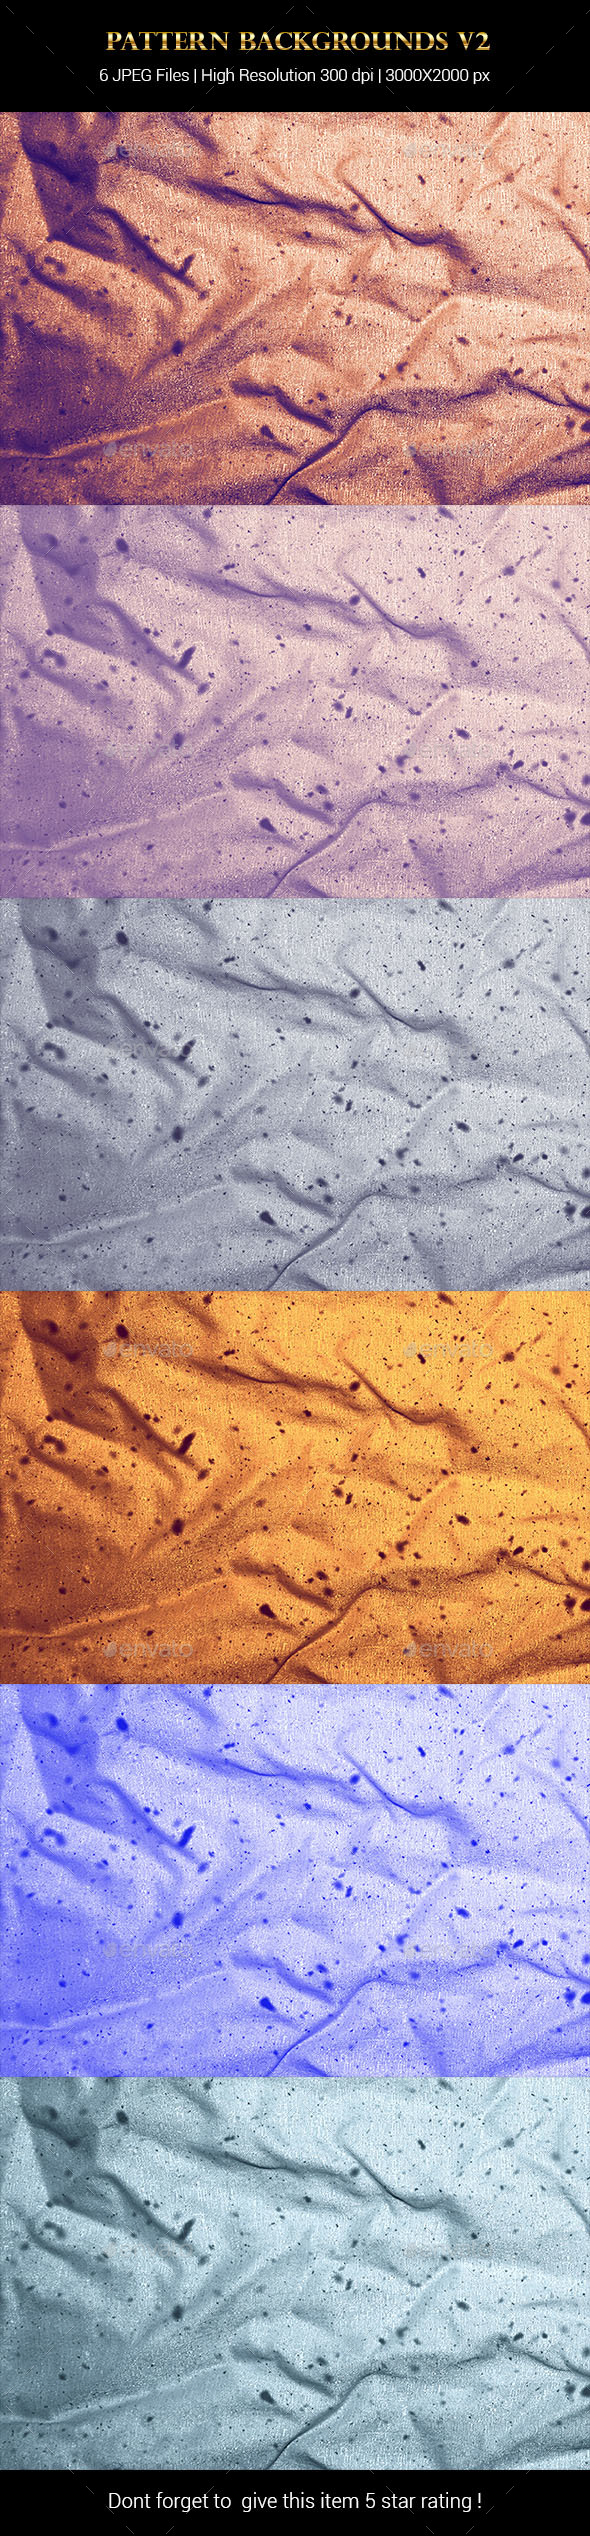 Pattern Backgrounds v2 - Backgrounds Graphics